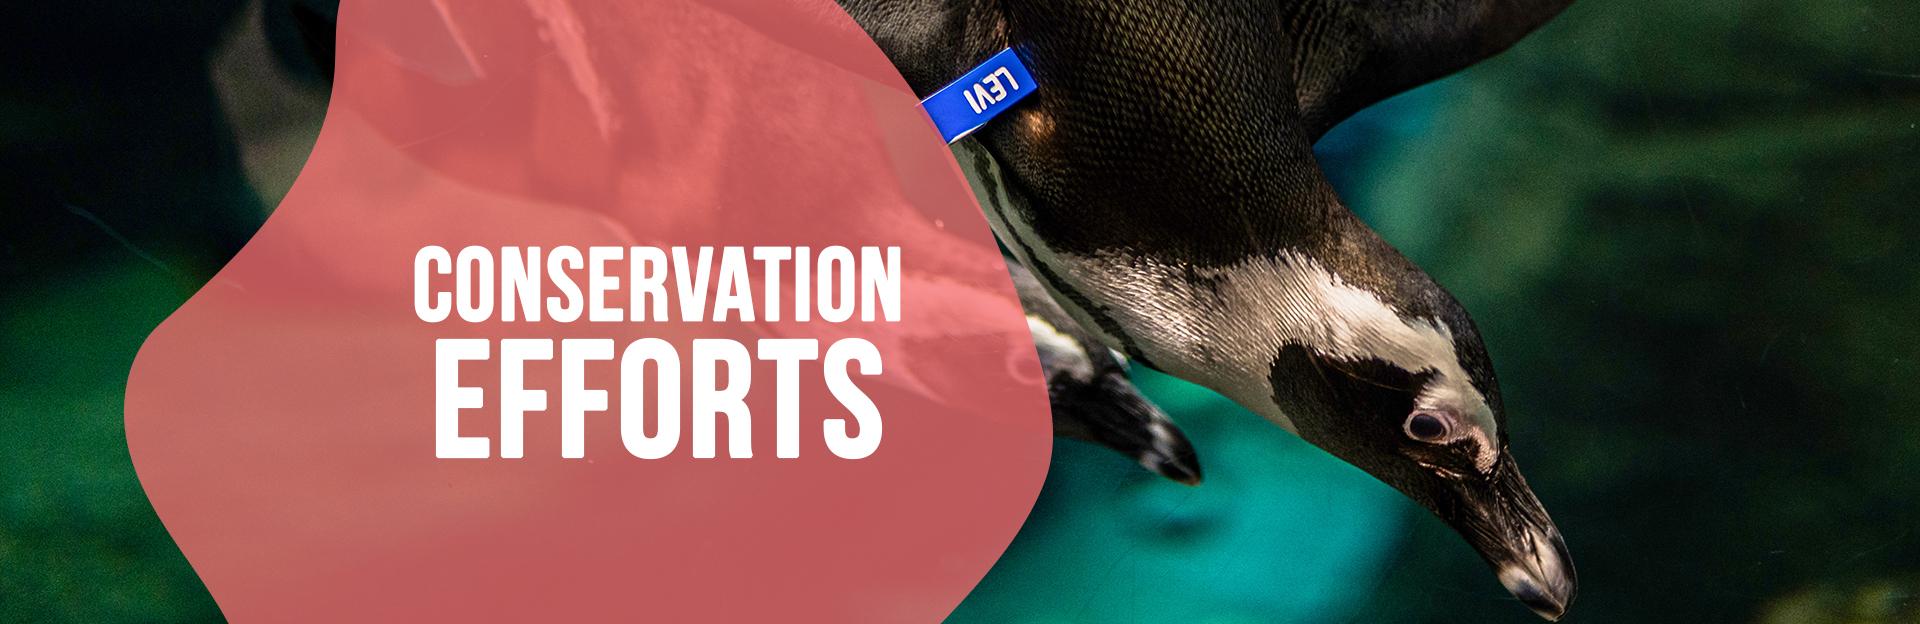 Header Image for Conservation Page